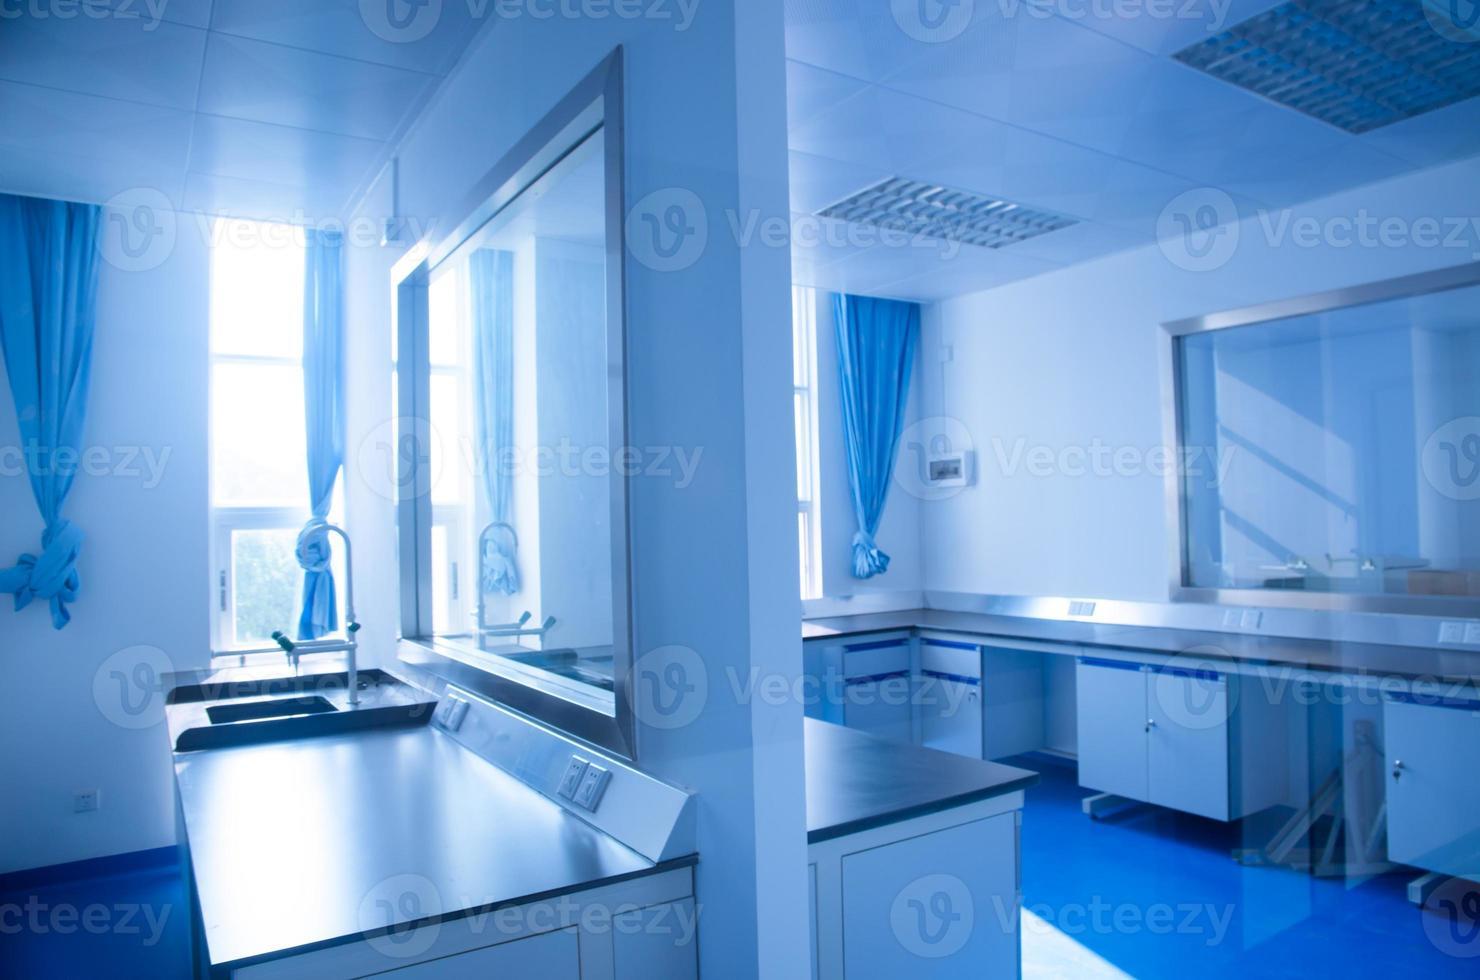 laboratoire scientifique moderne photo